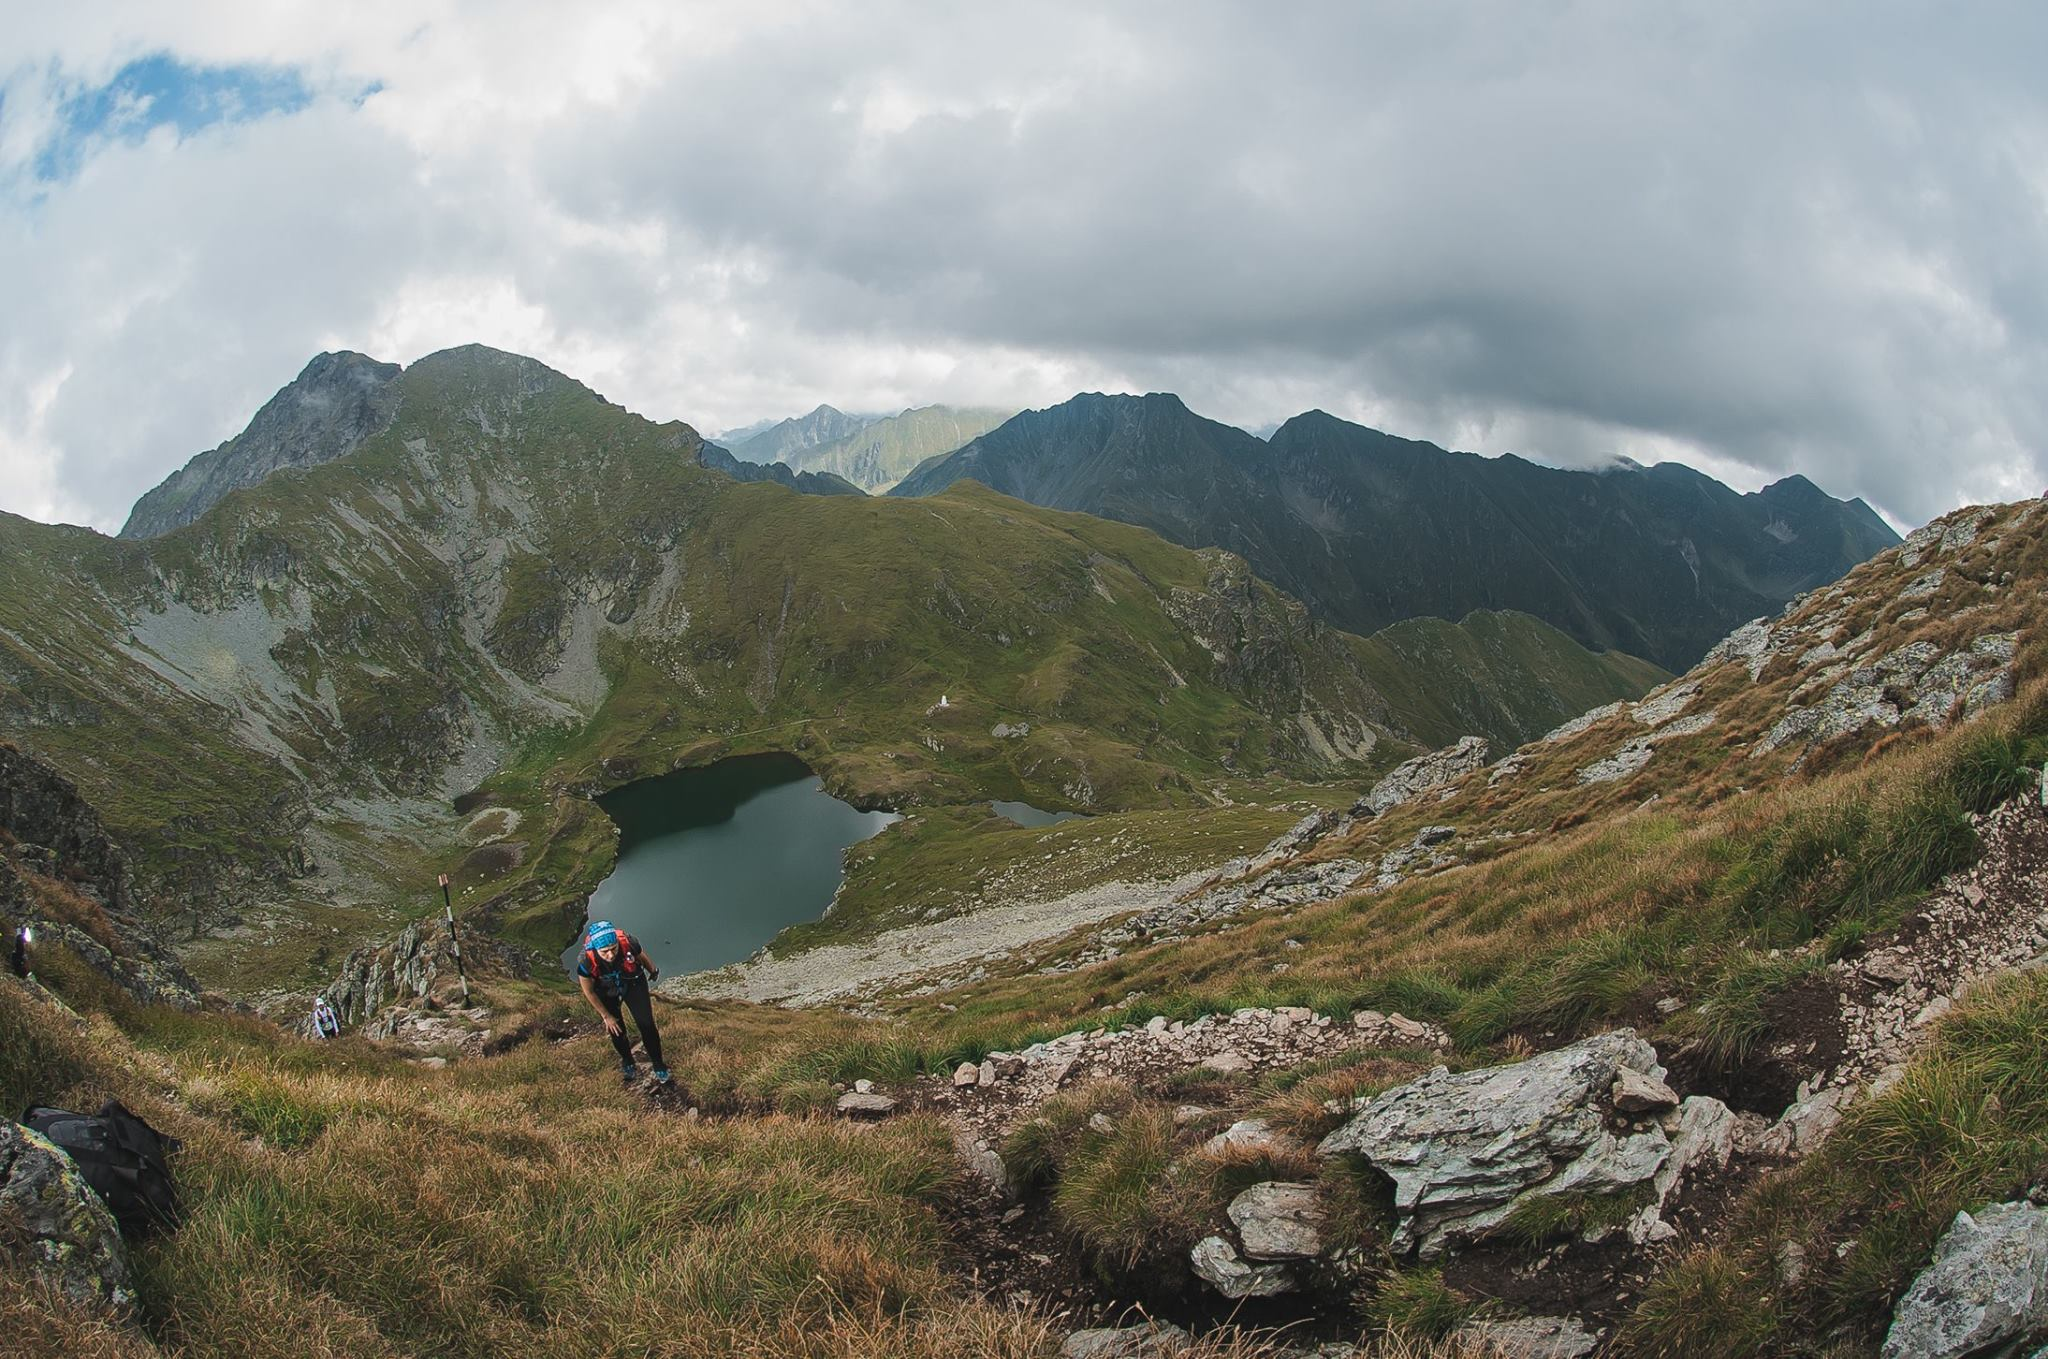 View of Balea Lake. Photo credit: Hila Tibi